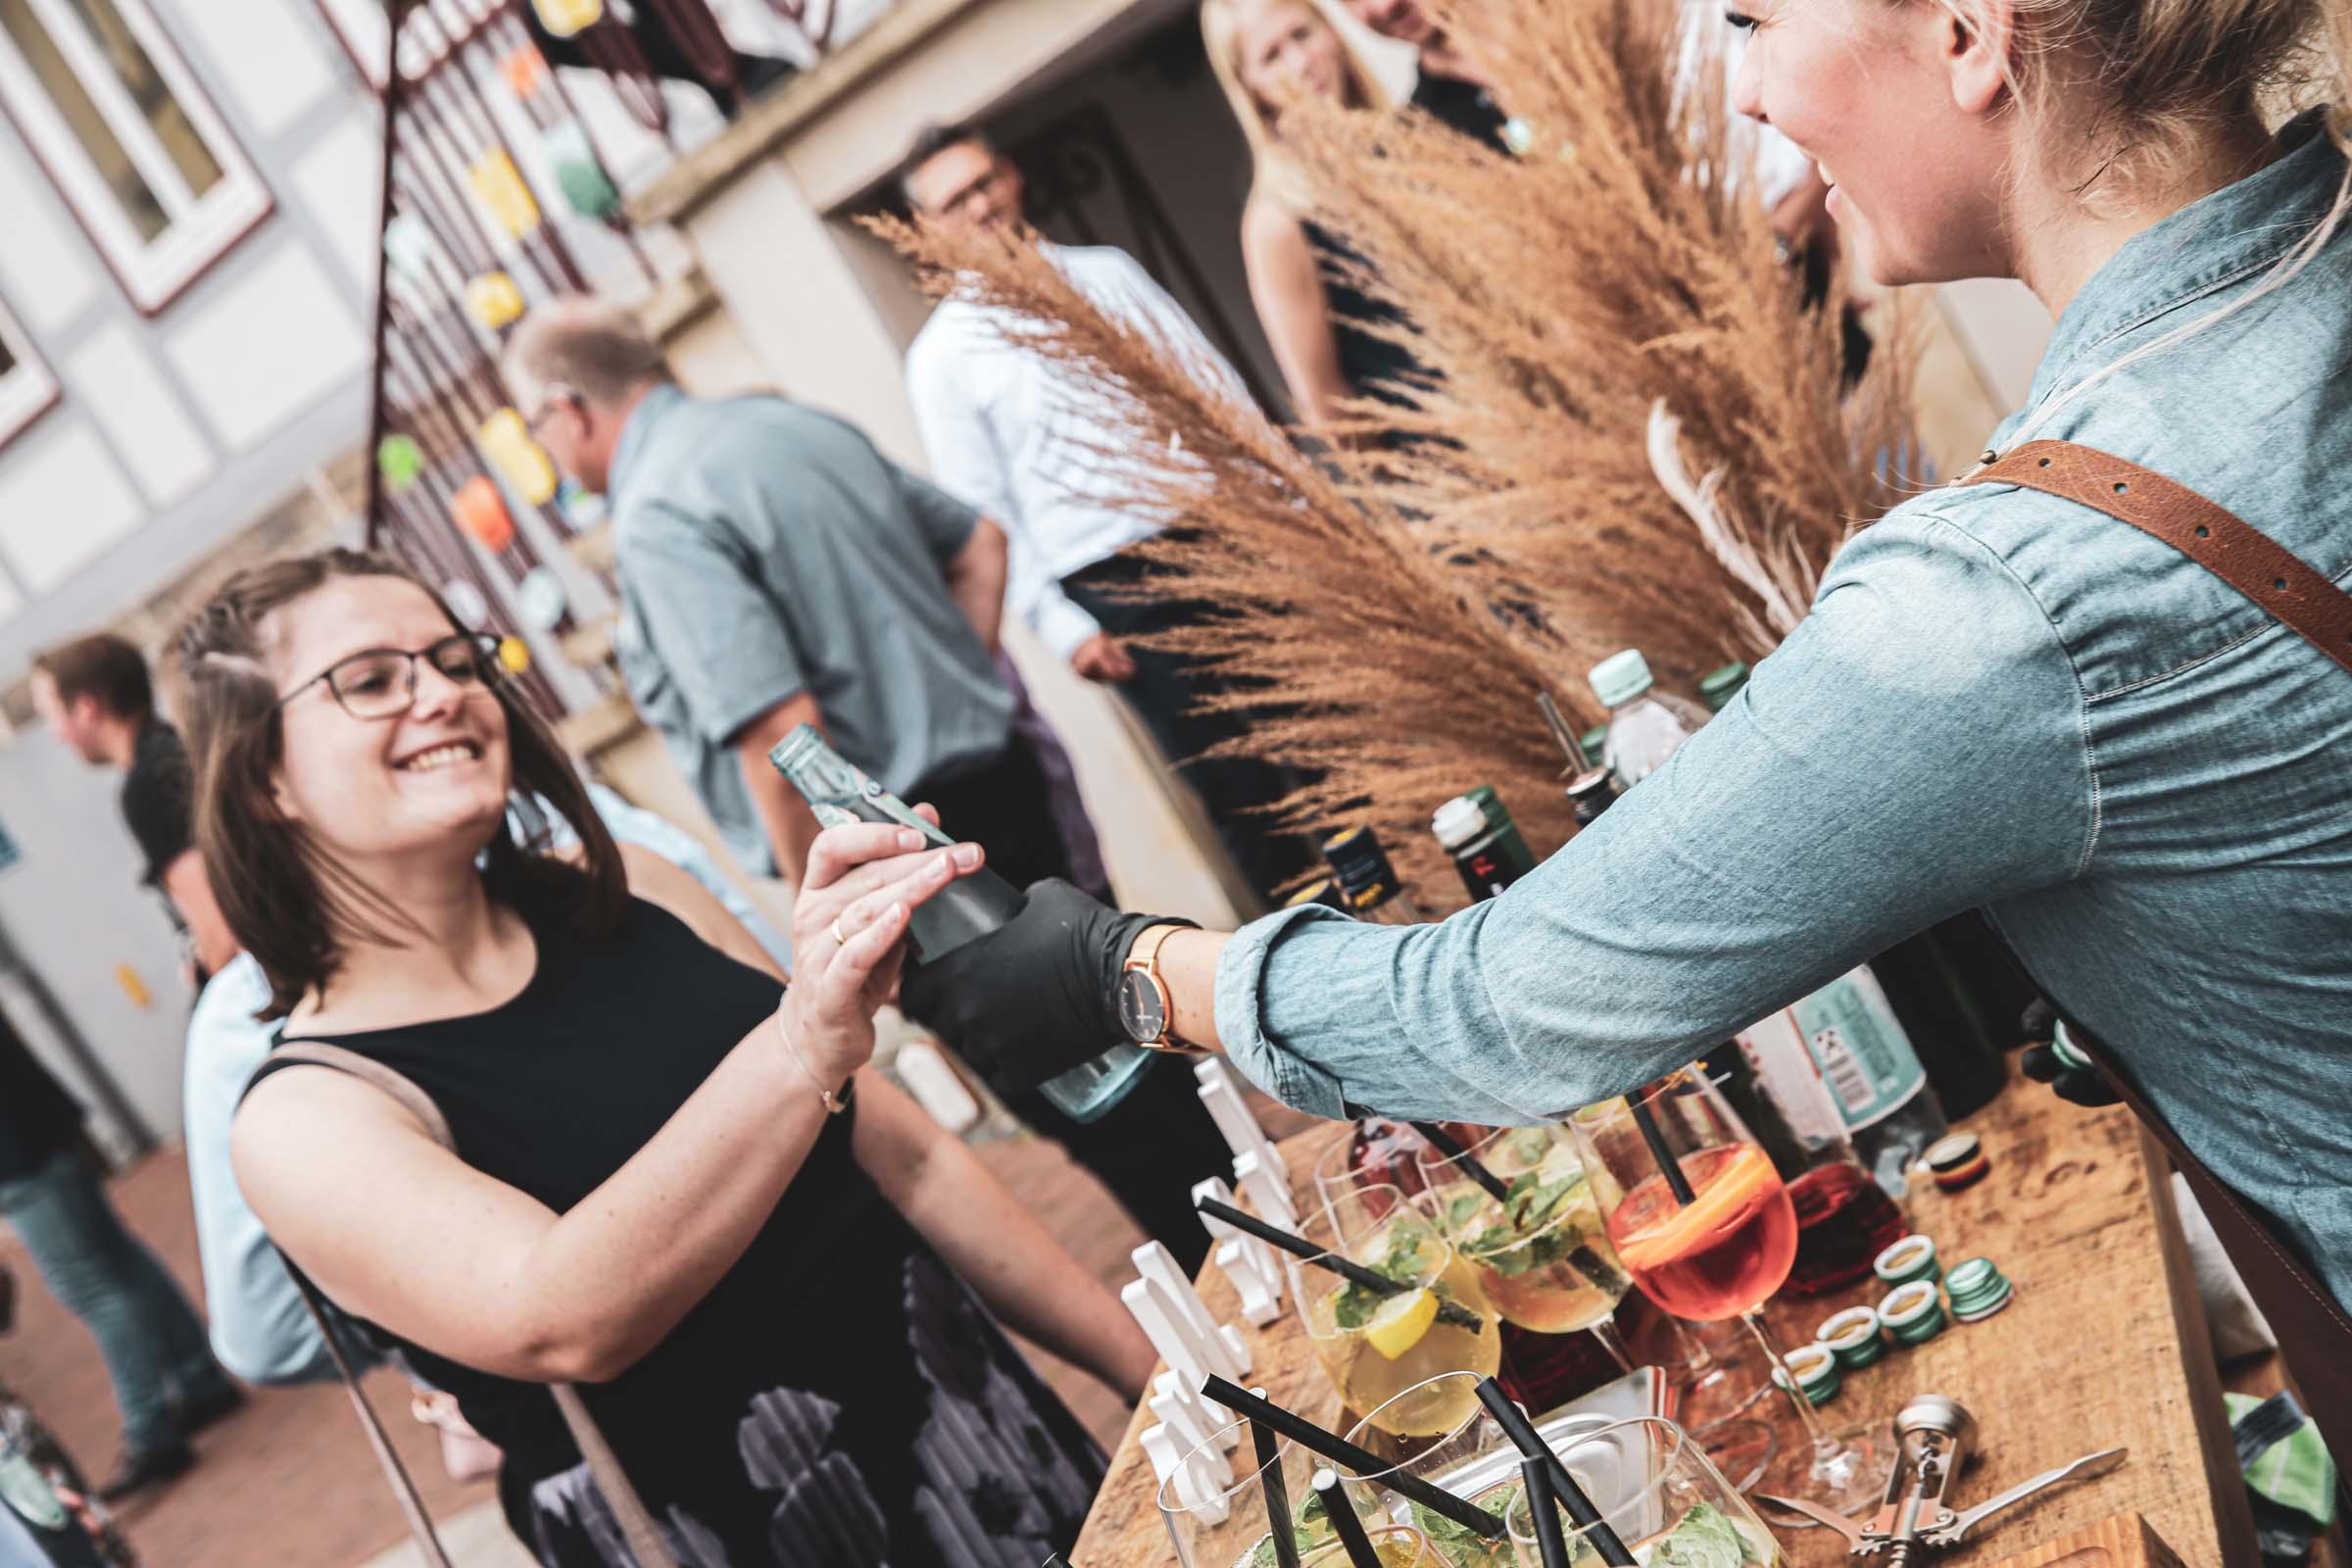 Cocktailservice | Hannover | Mobile | Bar | Bulli | VW | Barformat | Hochzeit | Standesamt | Barkeeper | Getränke | Catering | Ginbar | Weinbar | Sektbar | Cocktails | Buchen | Mieten | Anfragen